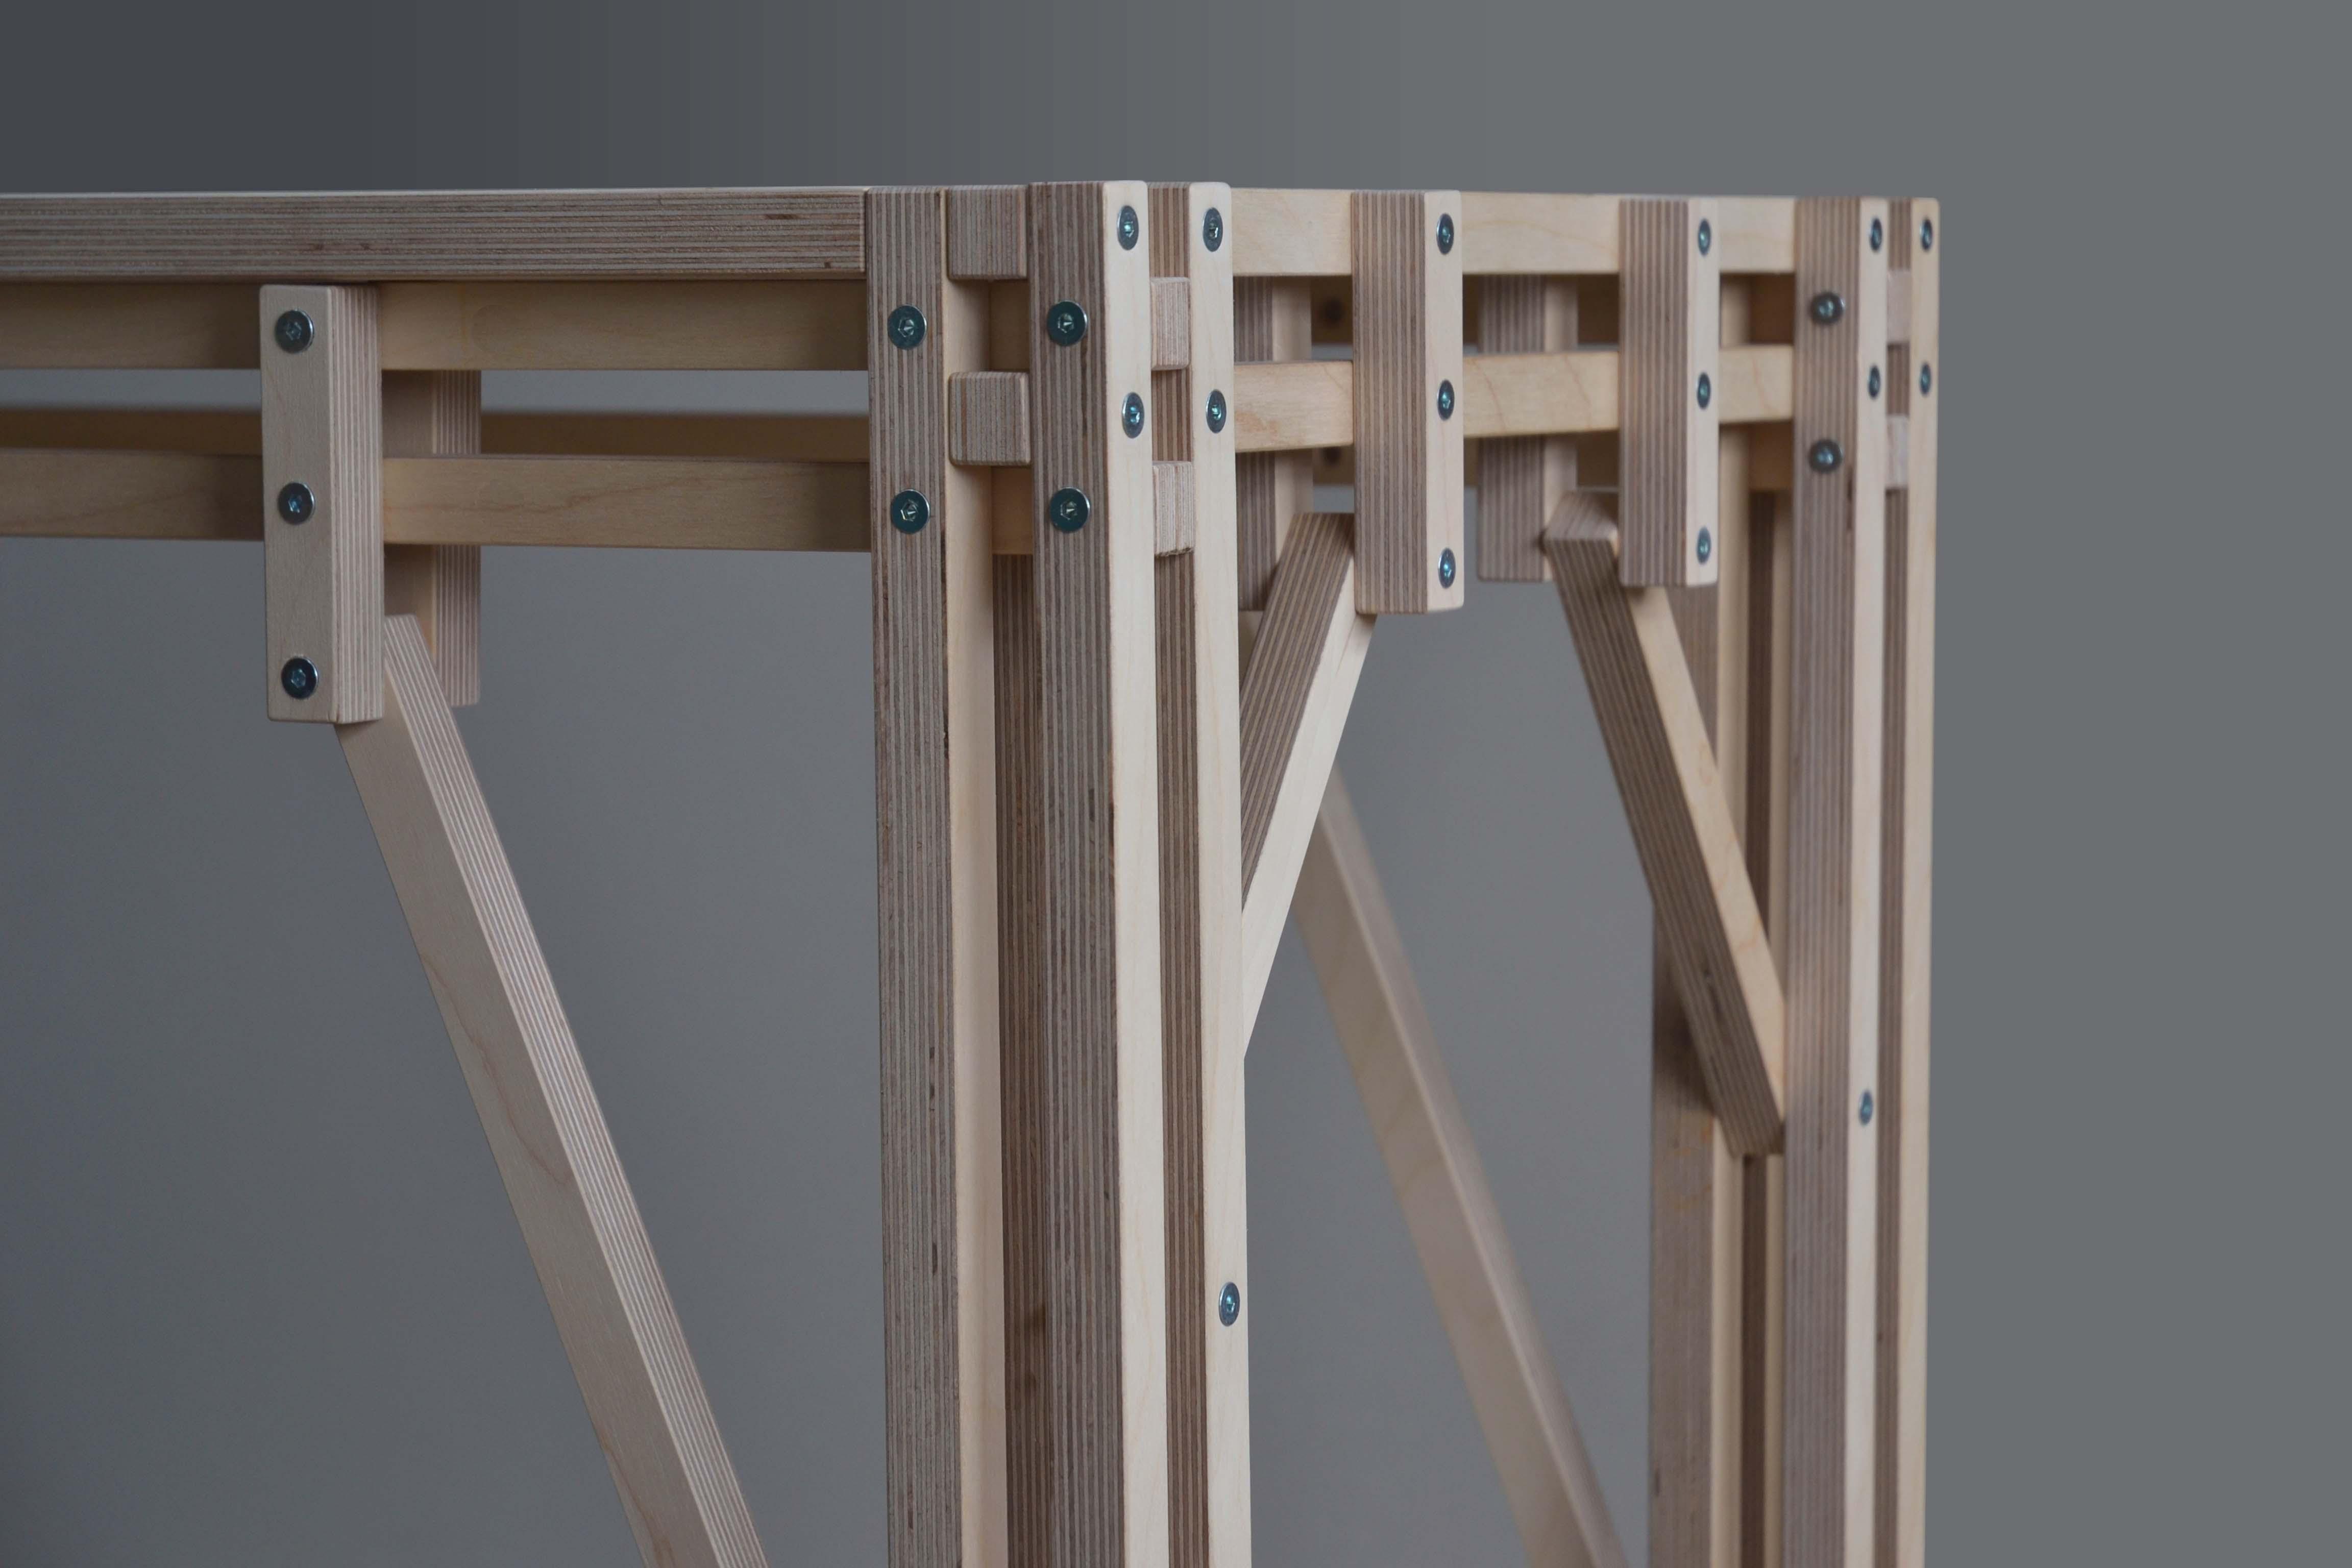 24 mm basic large table van arend groosman gimmii - Tafel archibald wereld huis ...